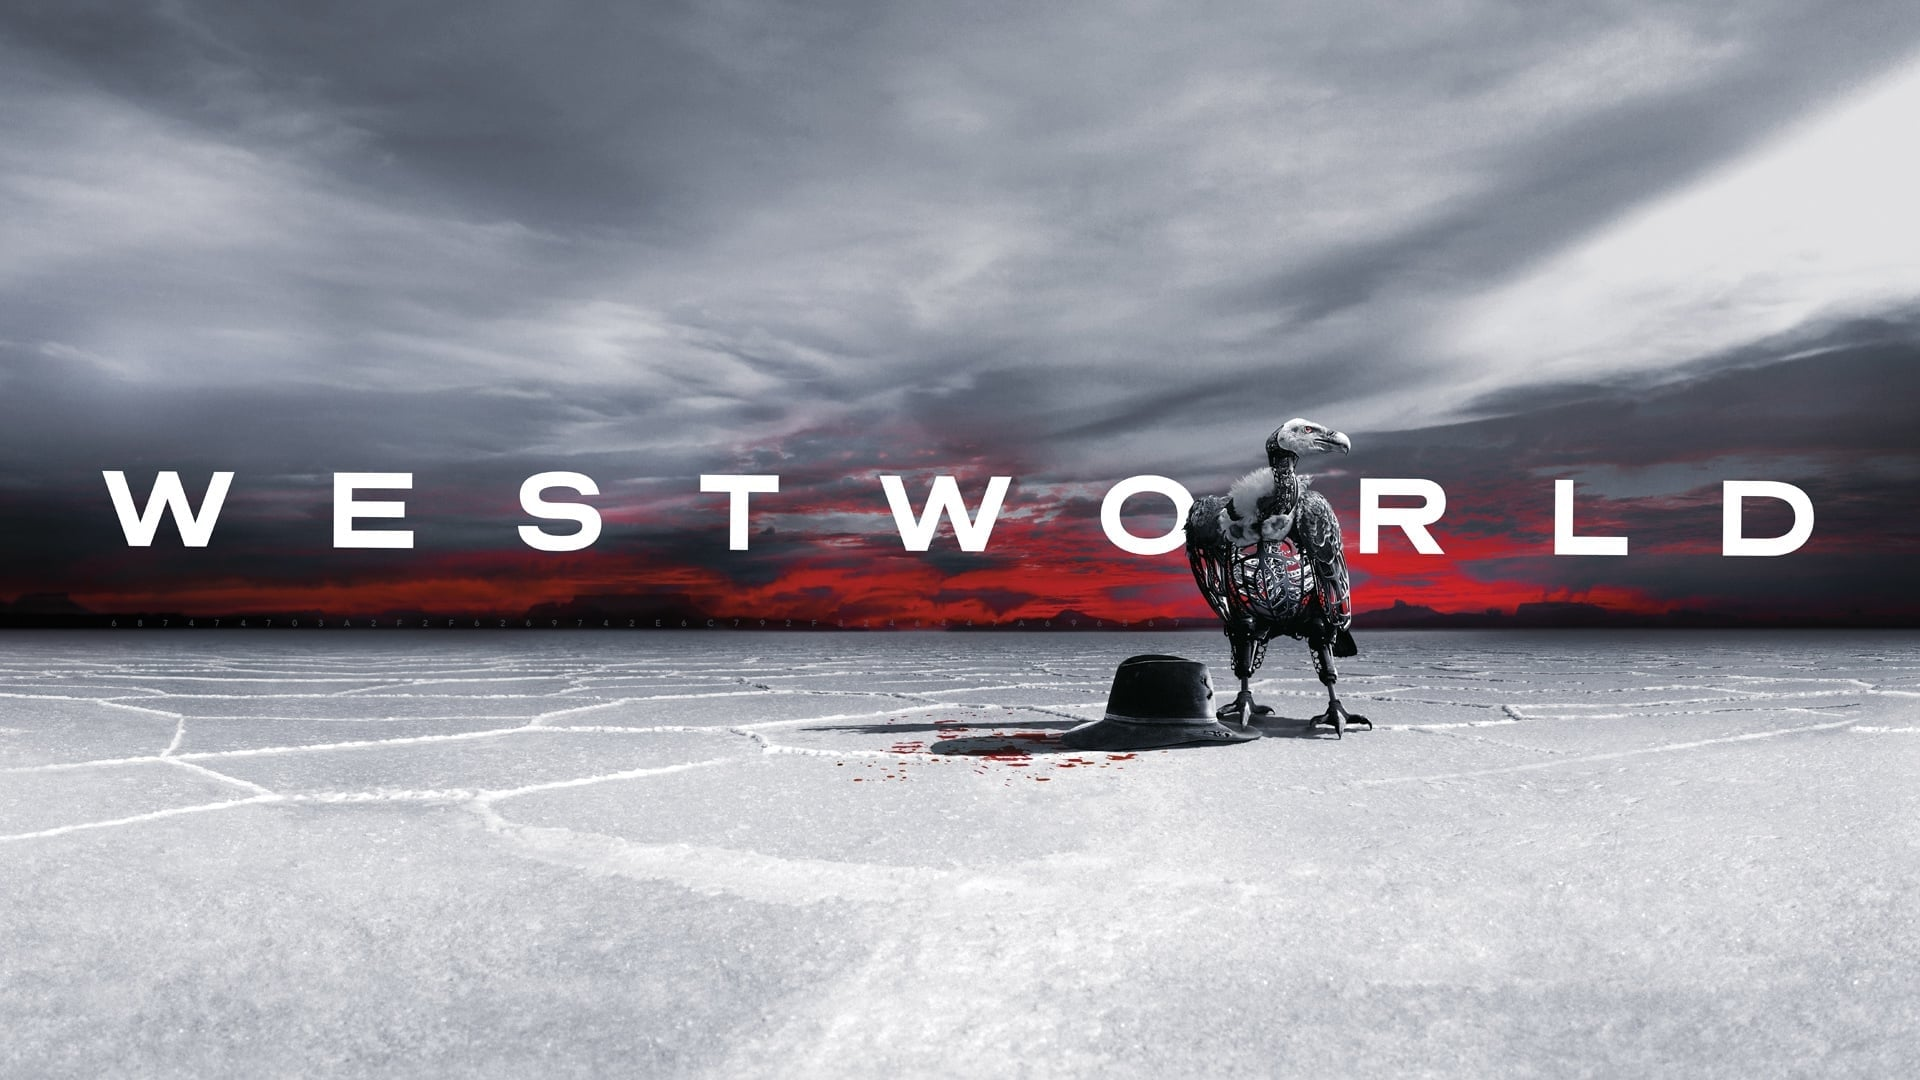 Westworld - Season 0 Episode 108